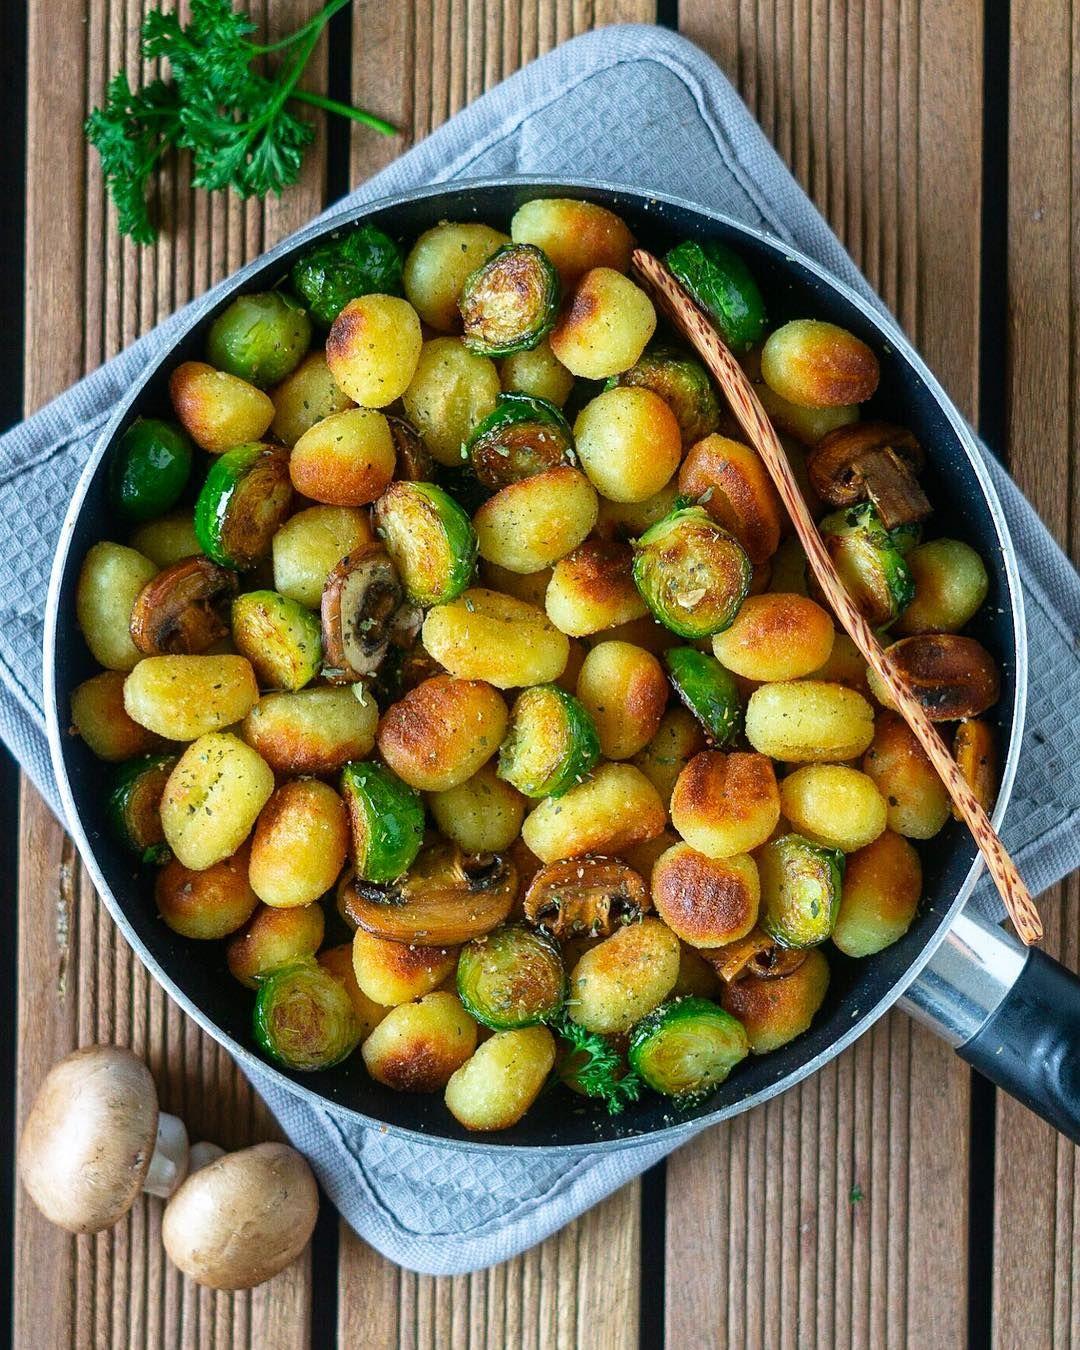 15 Minute Brussels Sprout Tempeh Stir Fry In Pursuit Of More Easy Vegan Dinner Tempeh Recipes Vegan Dinners